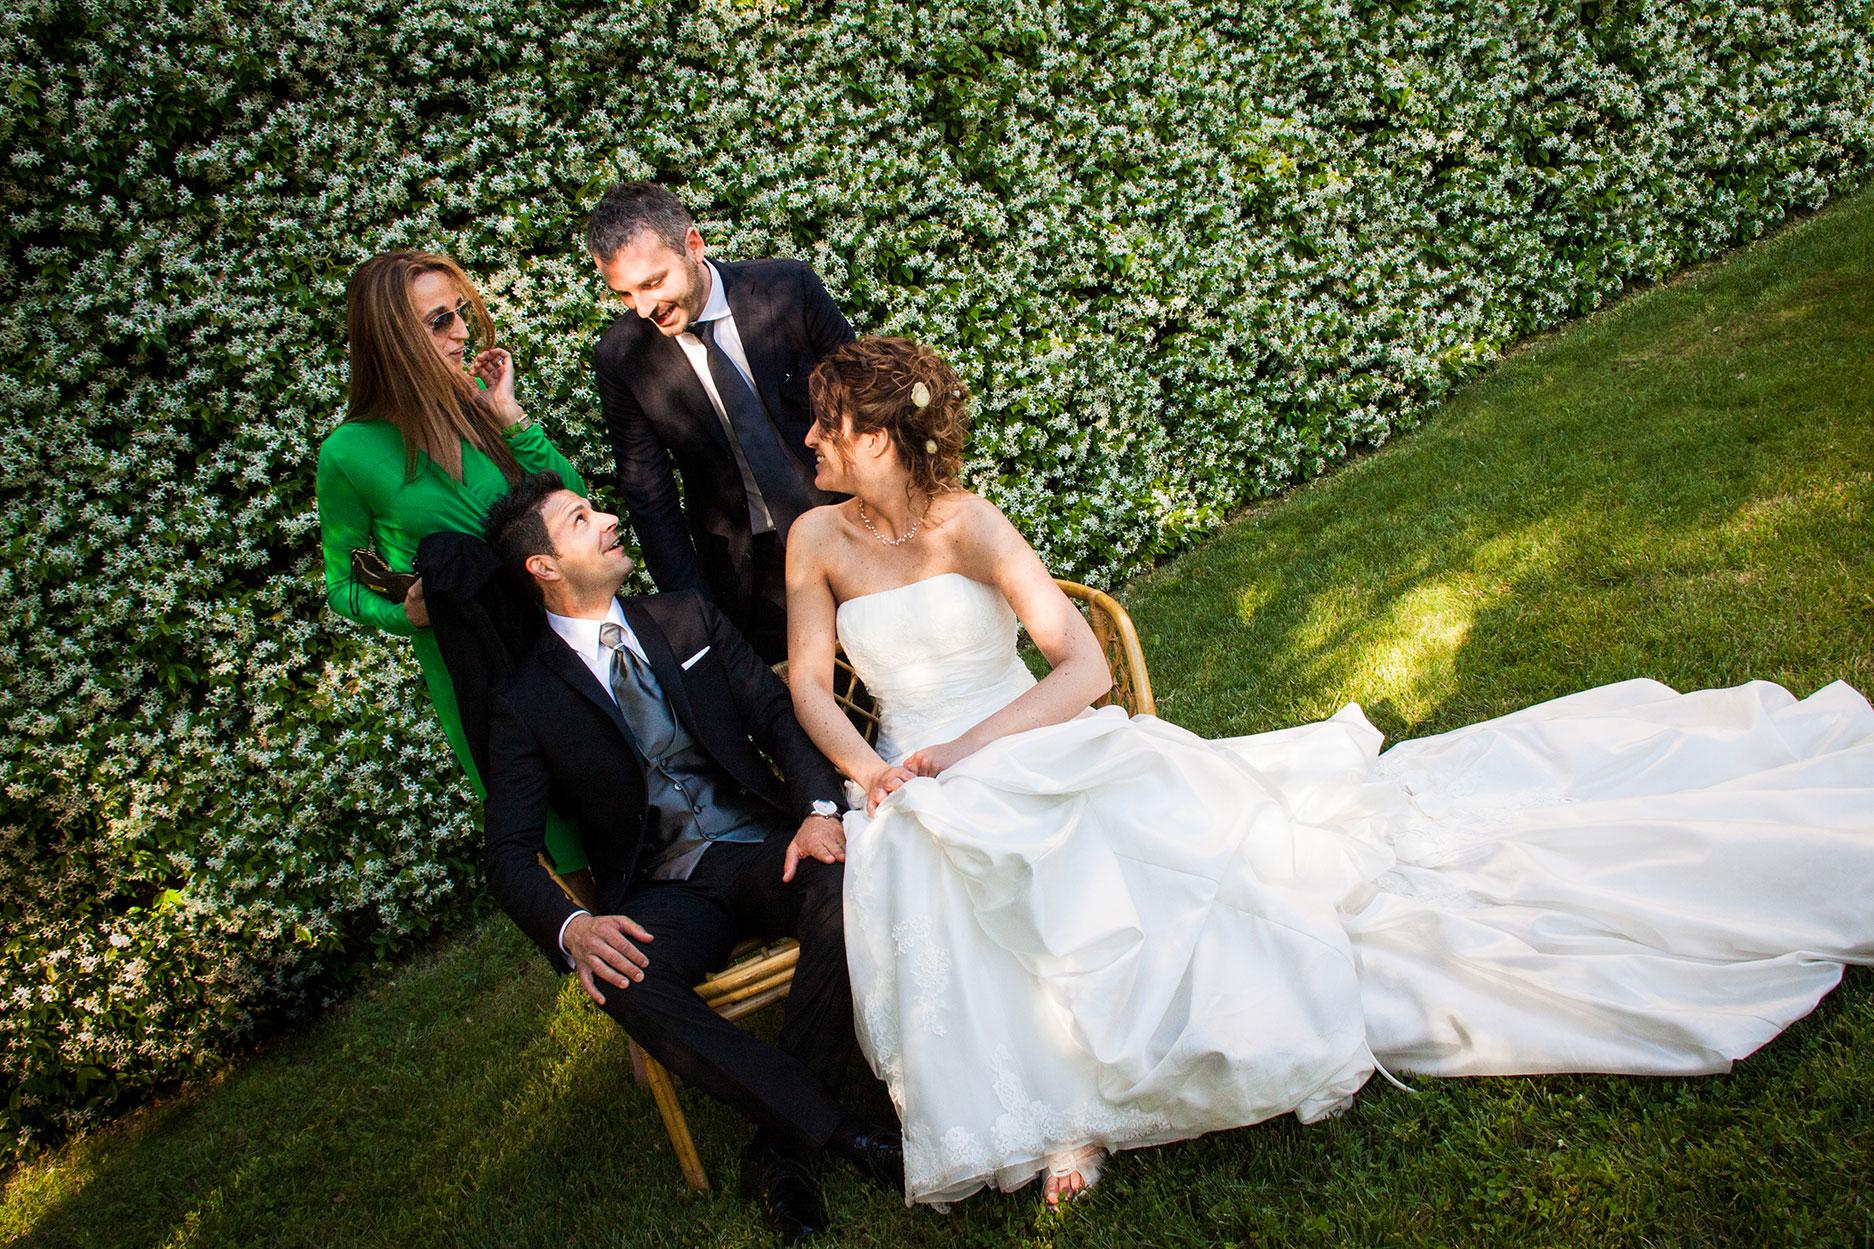 Francesca-Ferrati-wedding-photographer-Verona-Federica-Giovanni31